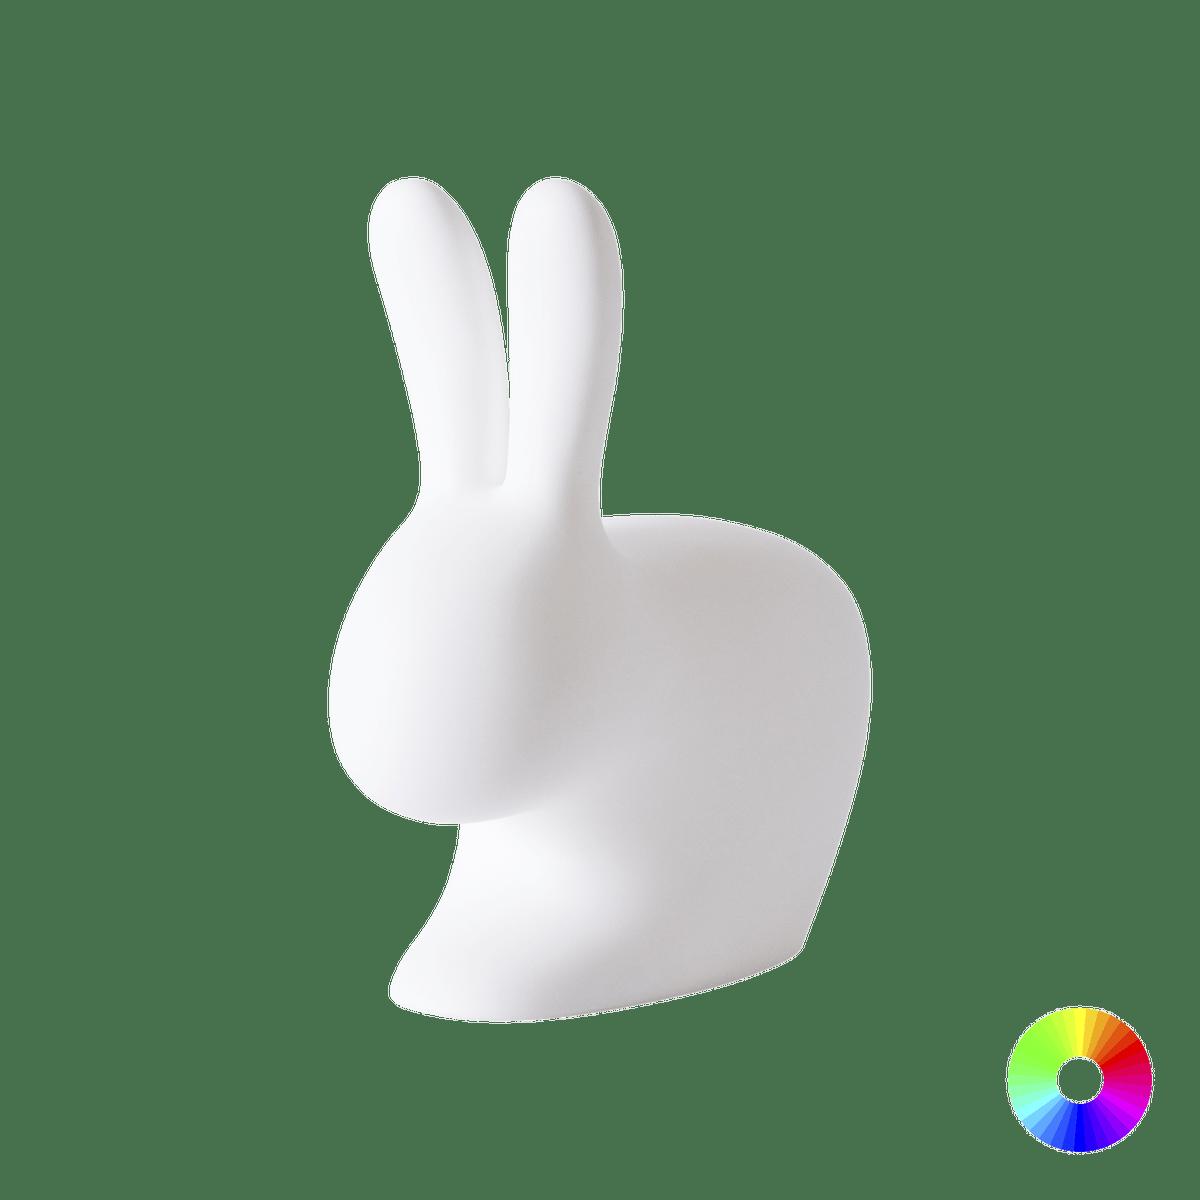 Lampa stołowa Rabbit XS